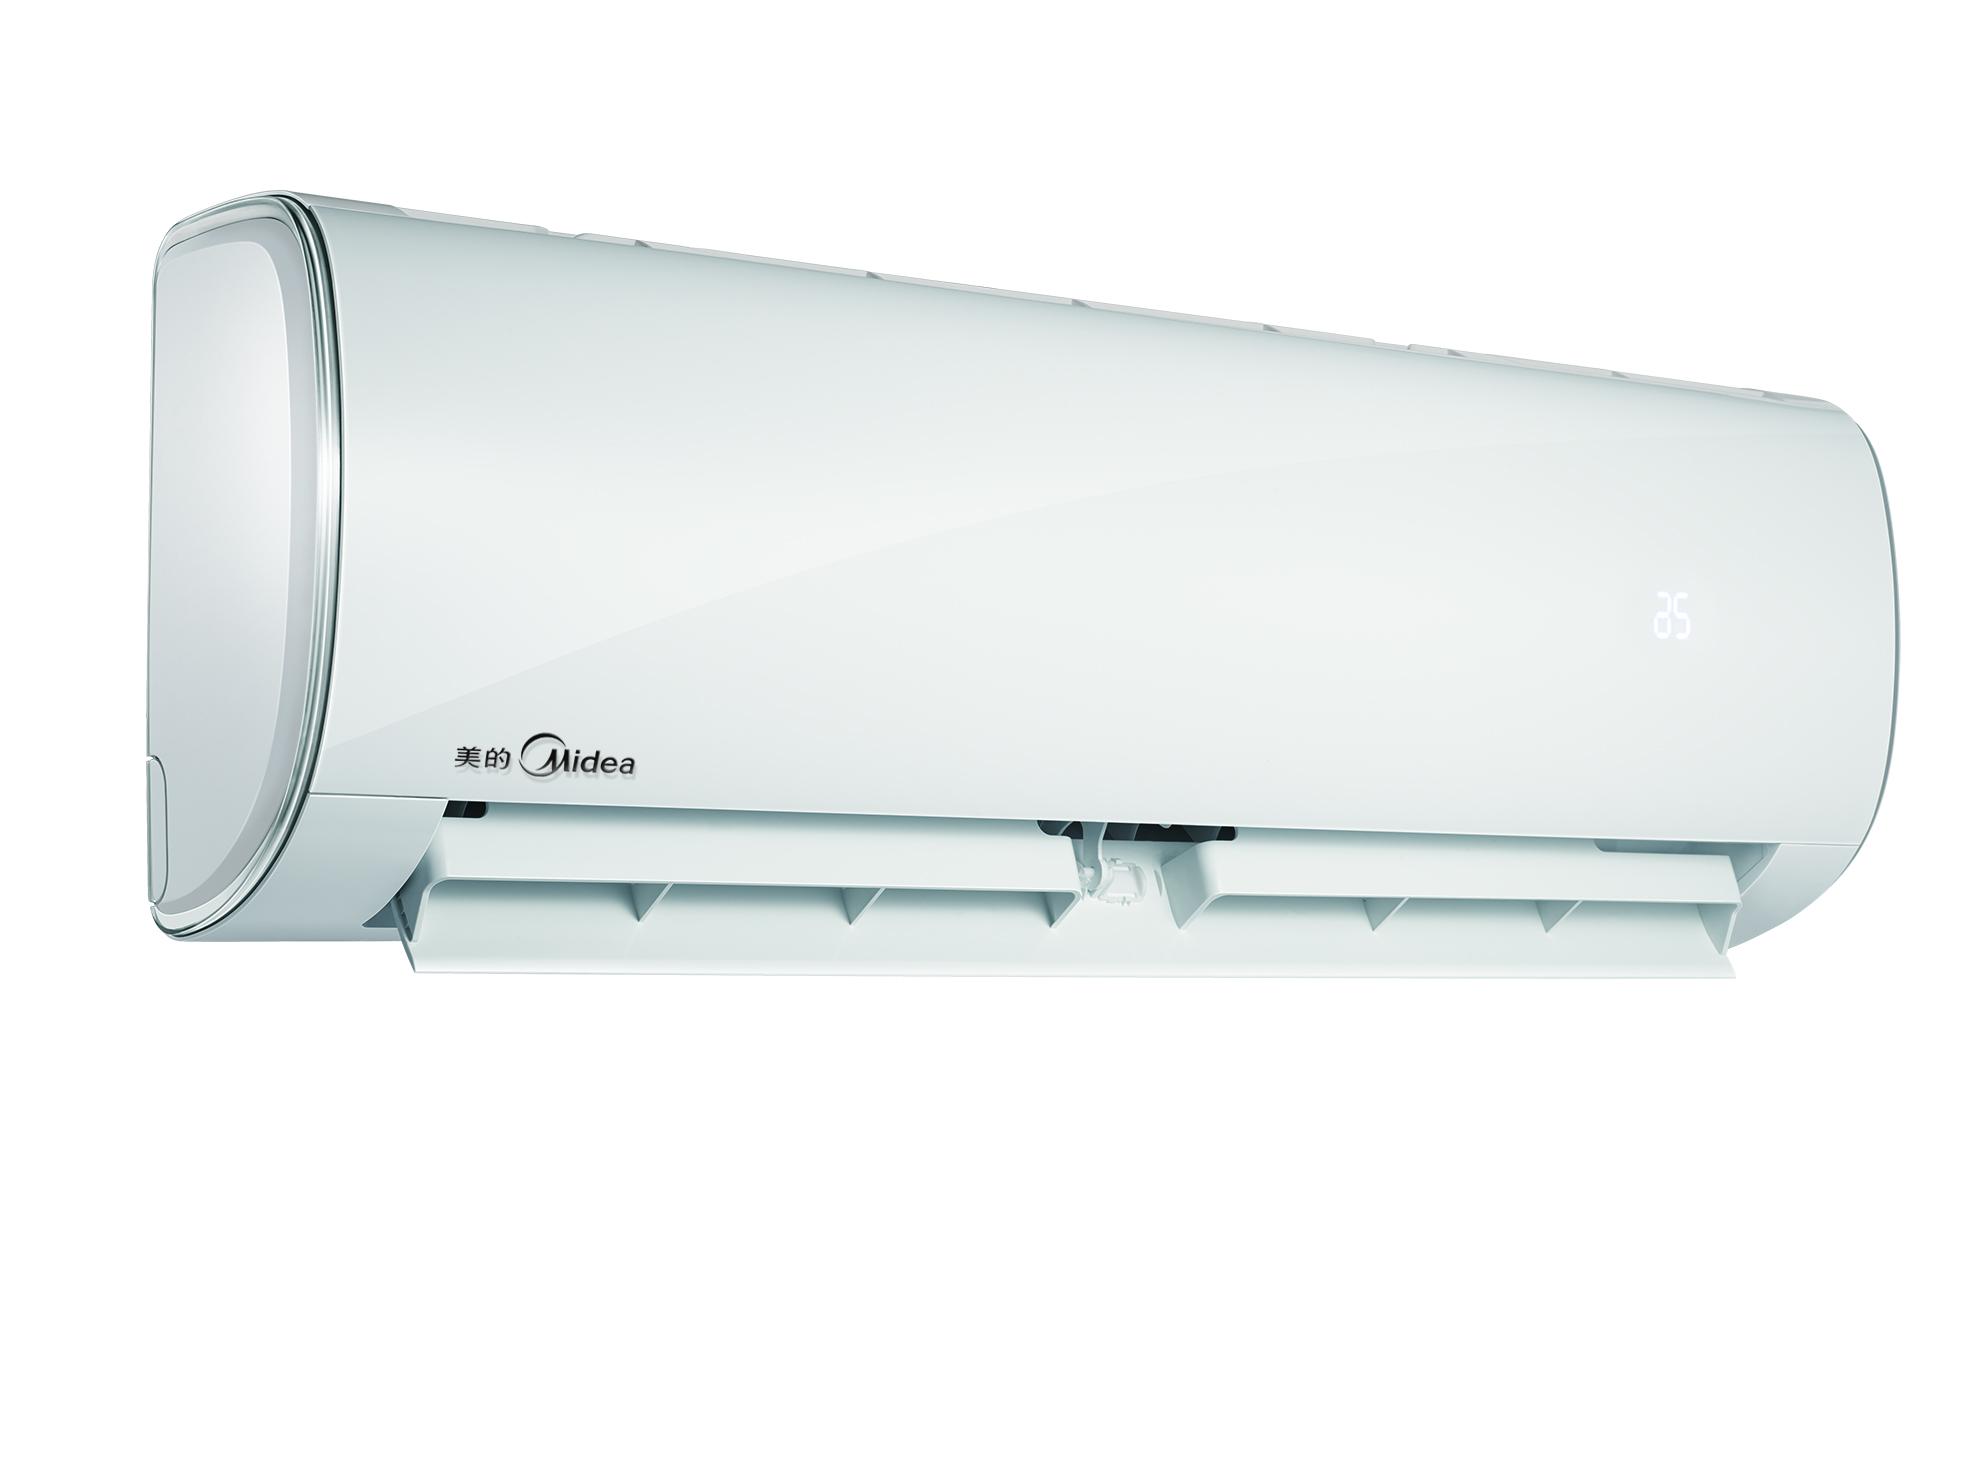 Midea/美的 KF-23GW/Y-PC400(D3)(陶瓷白)家用空调套机 说明书.pdf